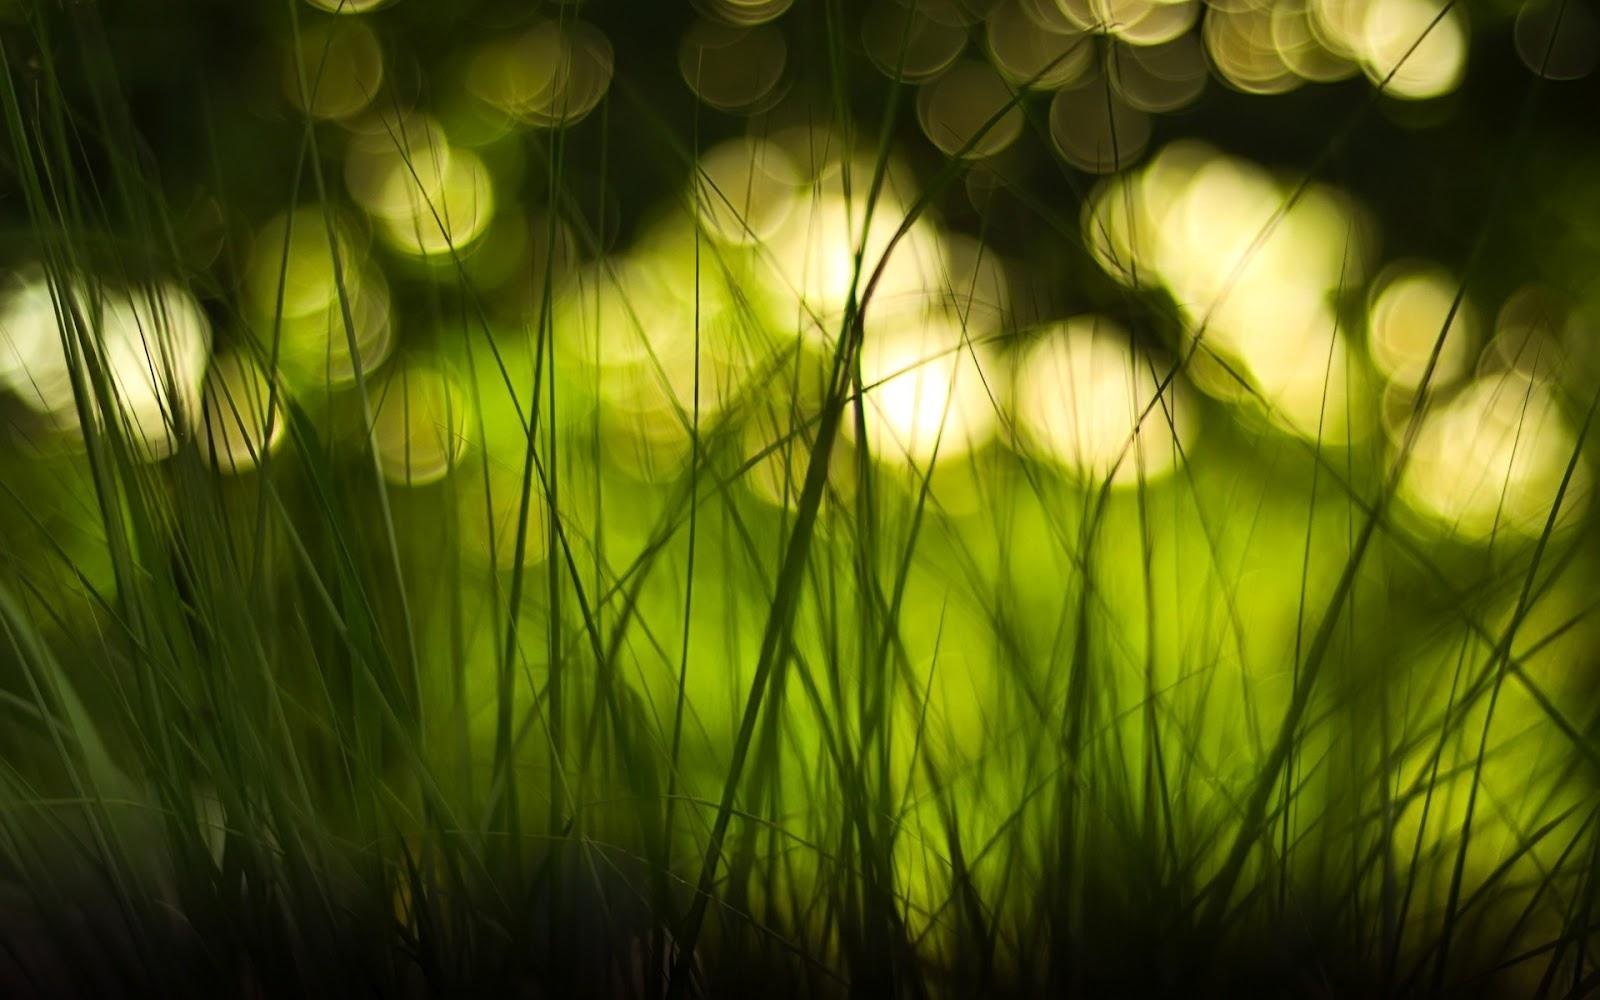 light blurred background hd - photo #24